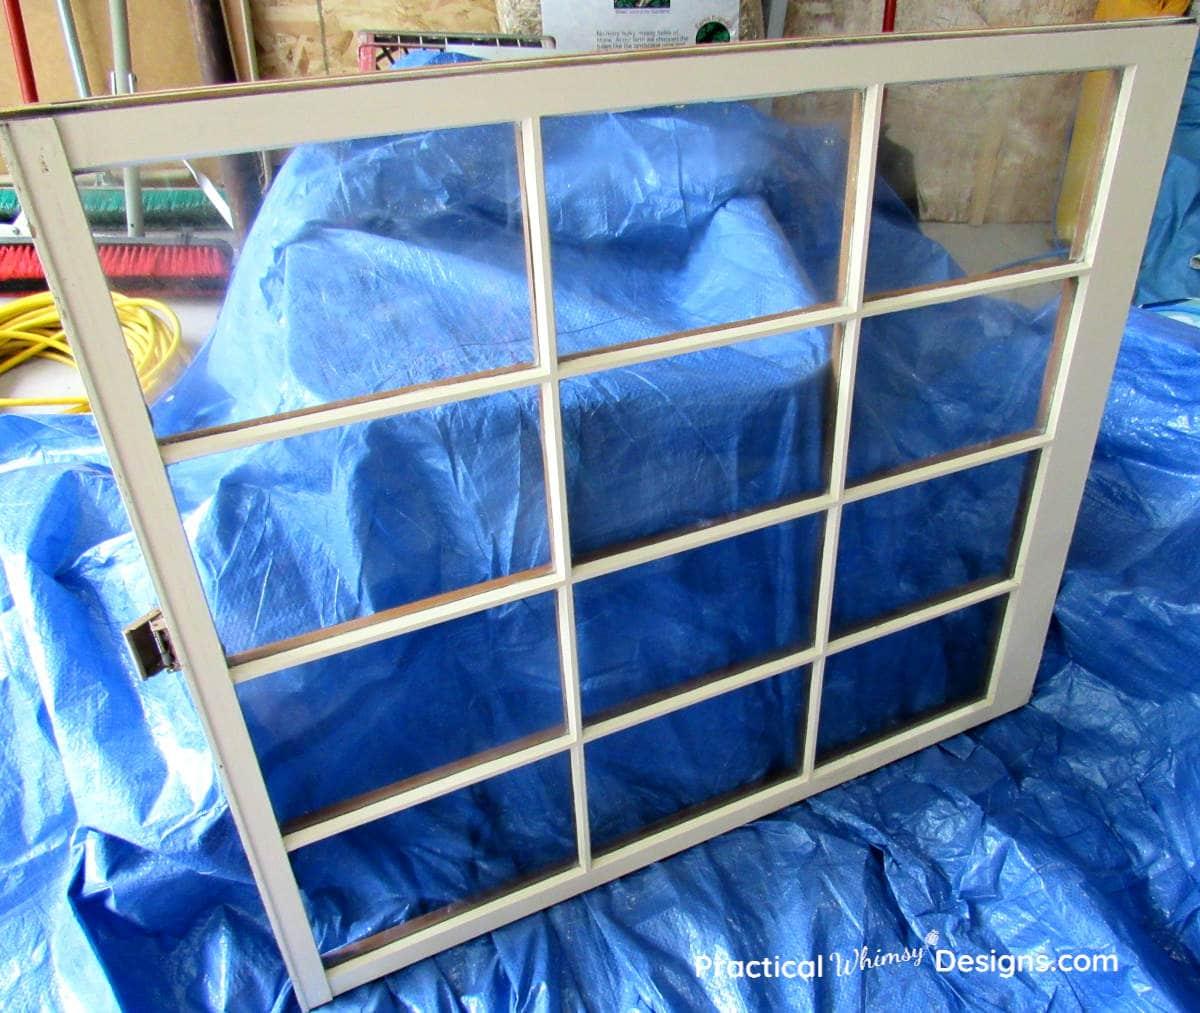 Glass window leaning against blue tarp